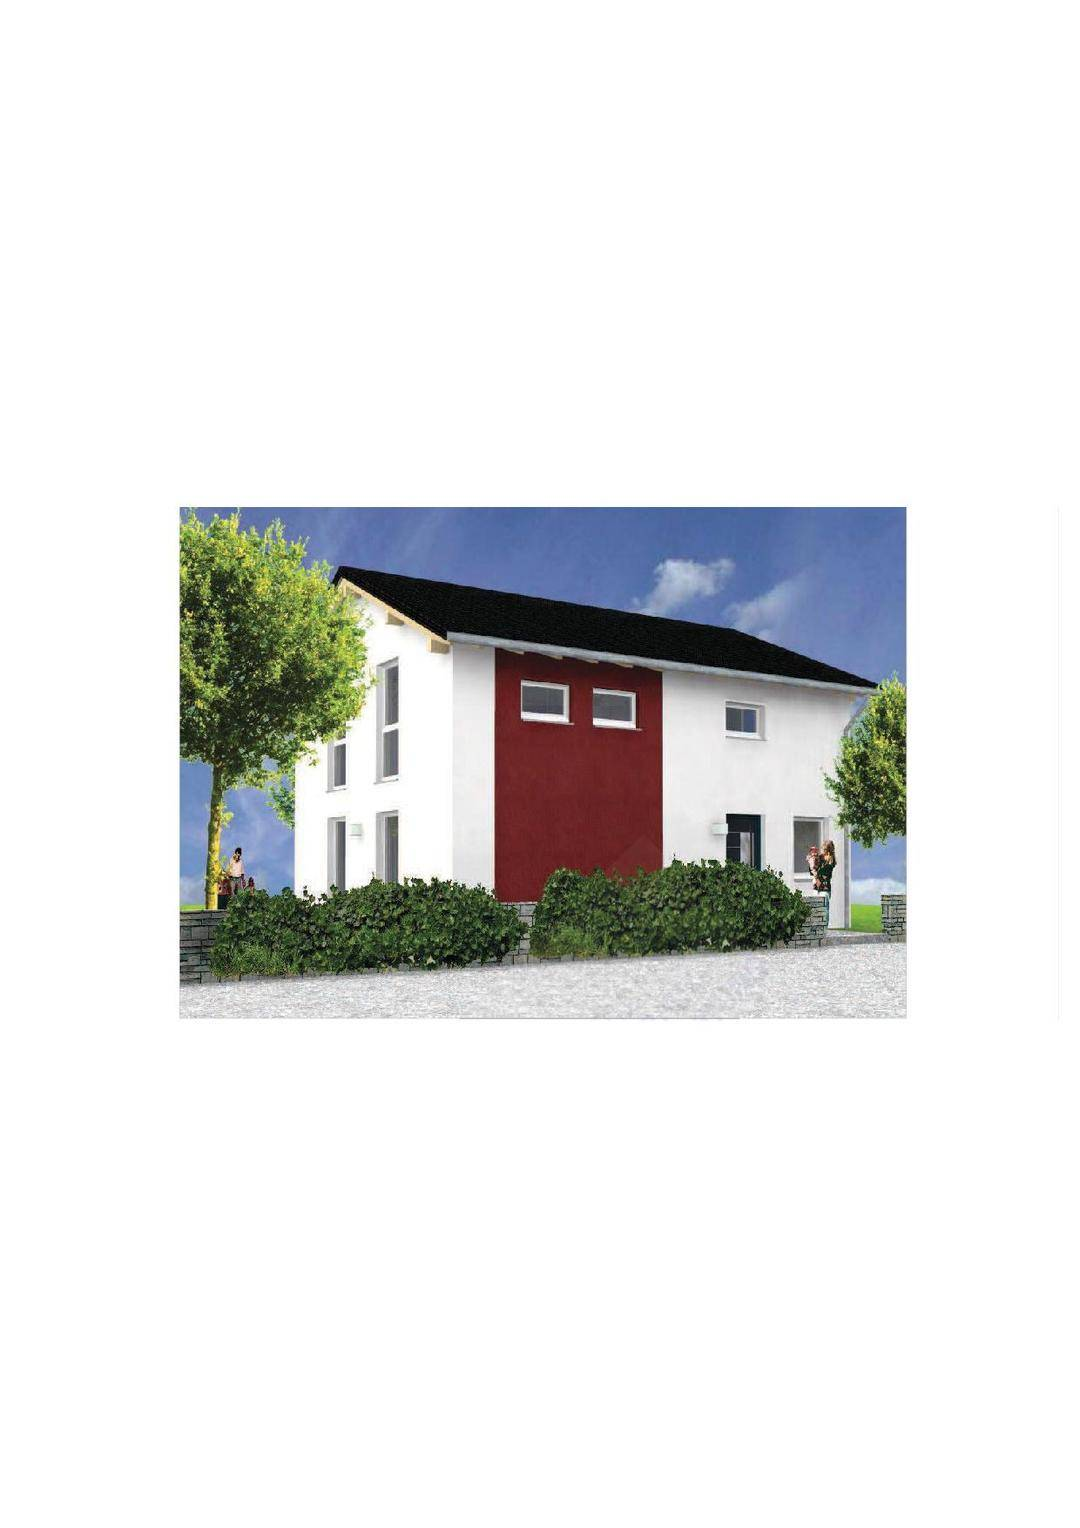 p32697.254252.1351783216797_005_Satteldachhaus_WR12-140_Hausdaten.jpg